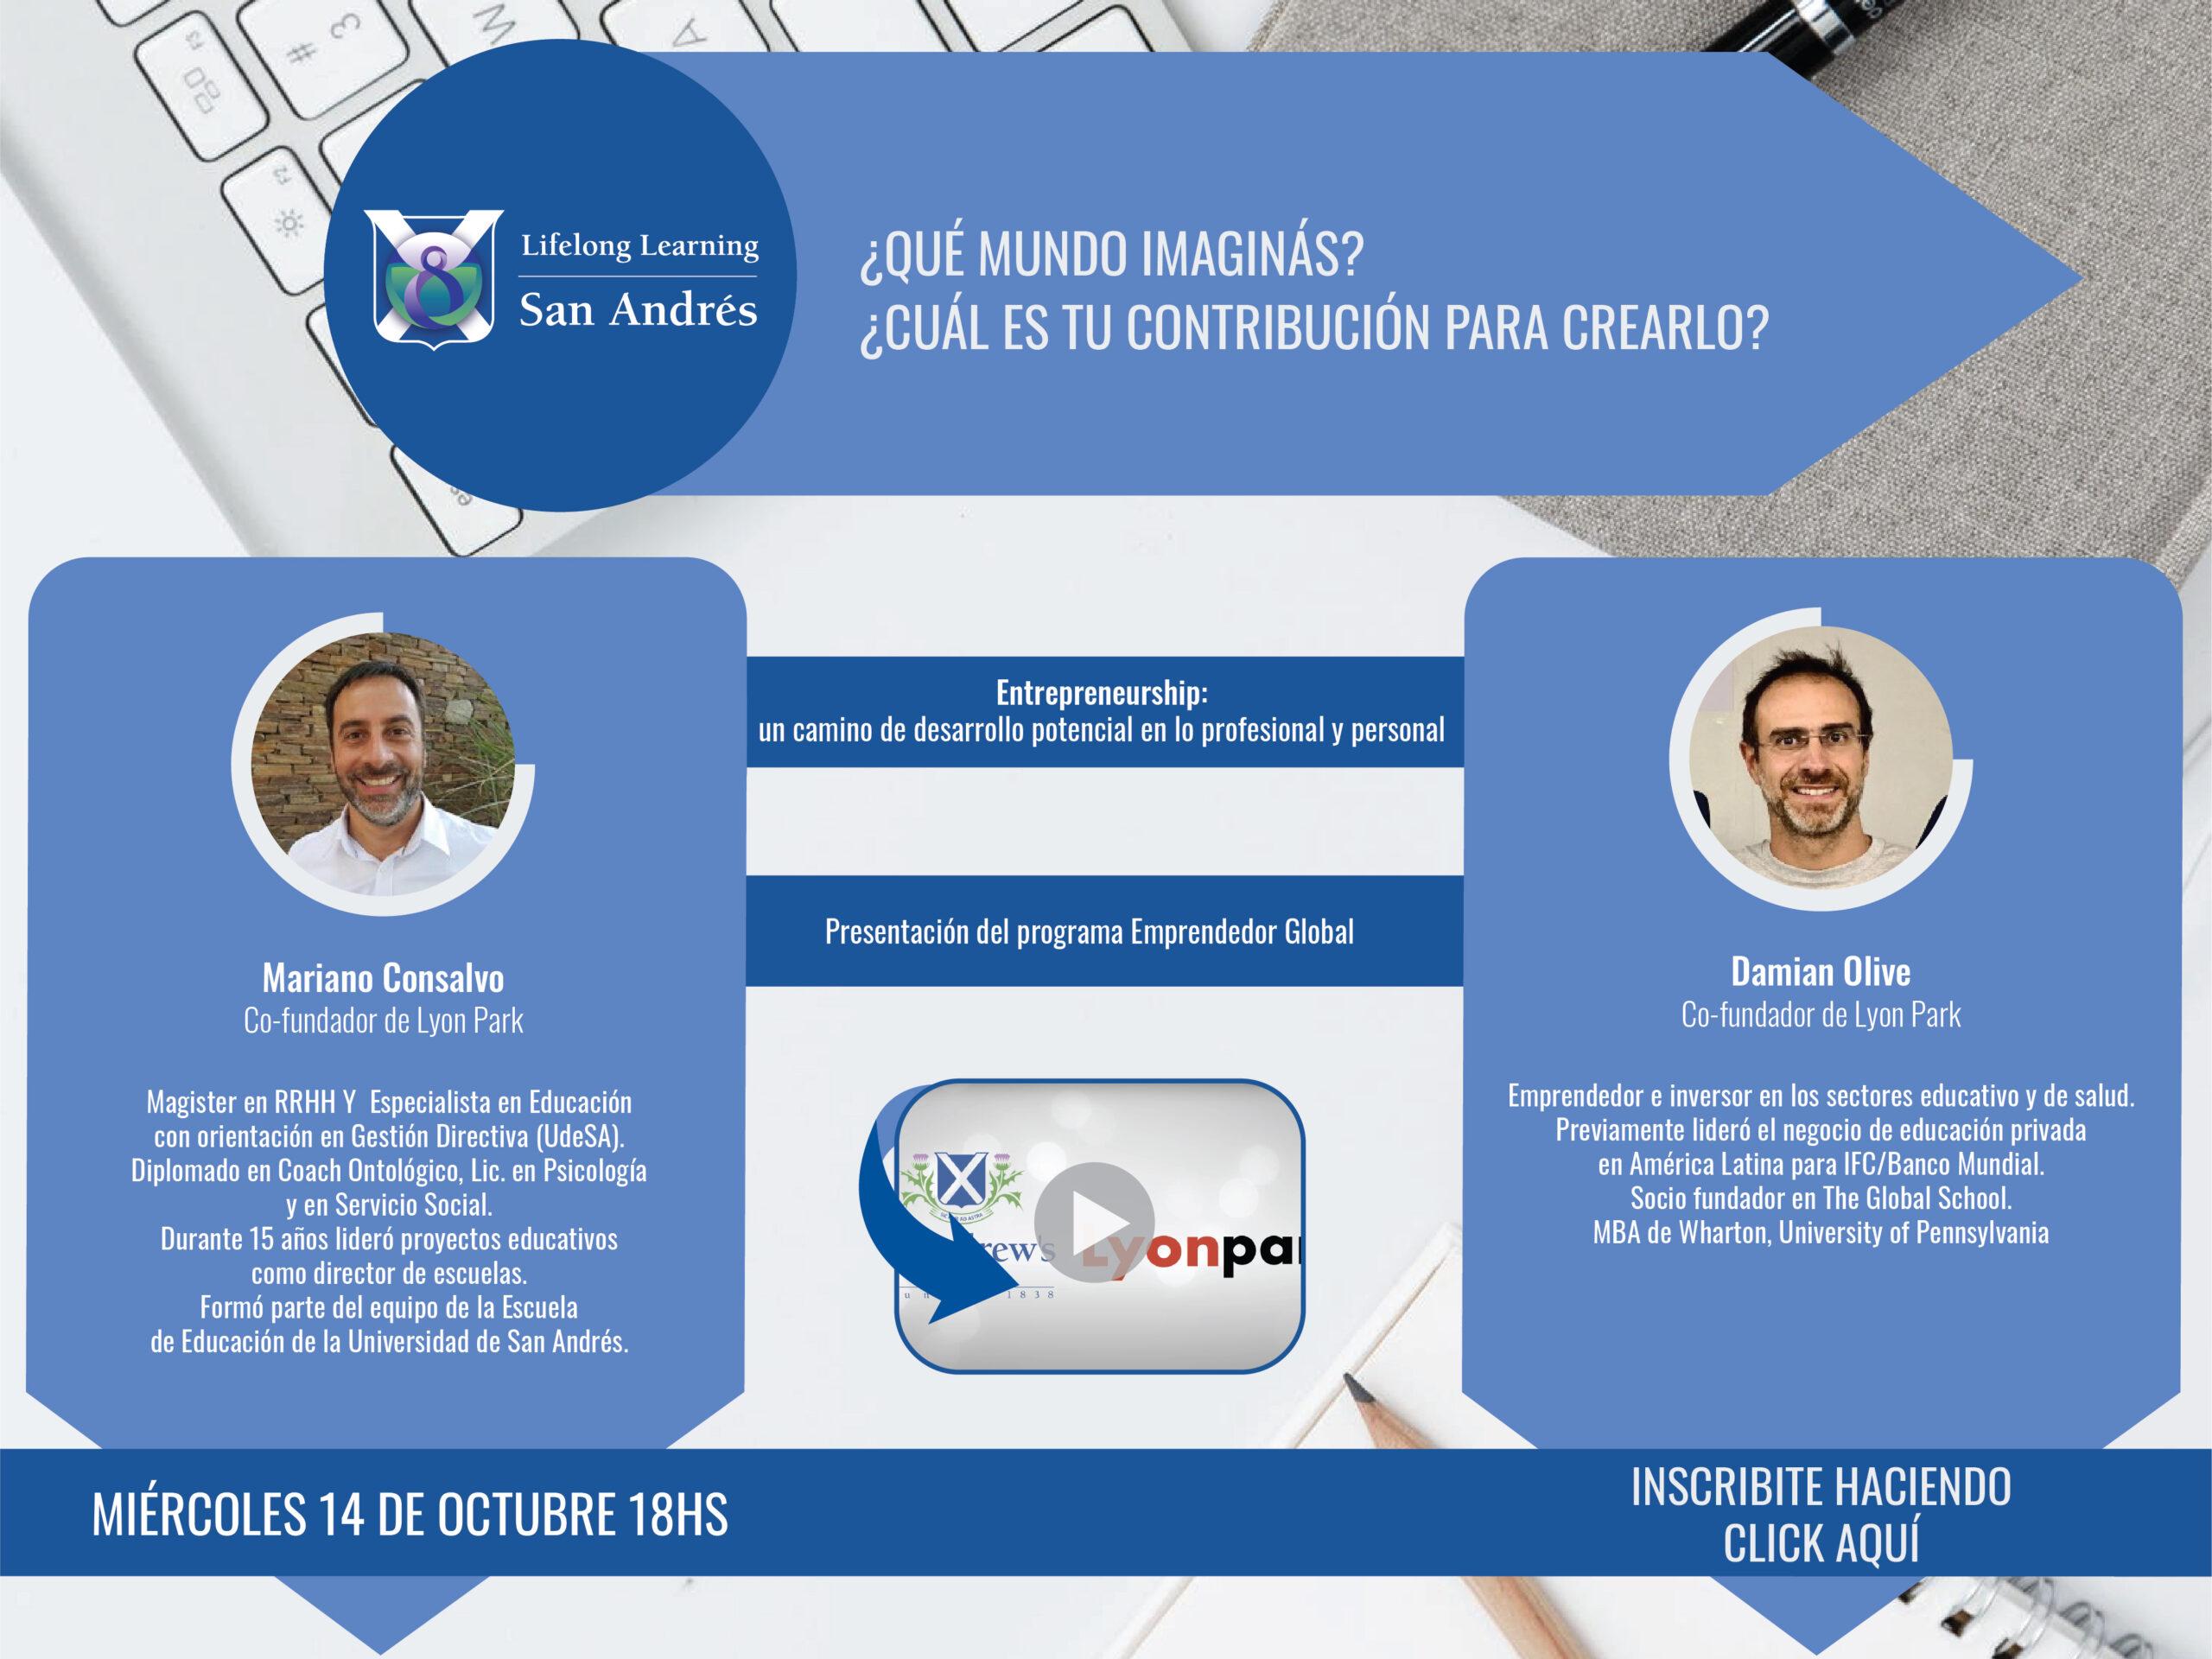 Lifelong Learning San Andrés : ¿Qué mundo imaginas? Programa Emprendedor Global – Miércoles 14/10- 18hs